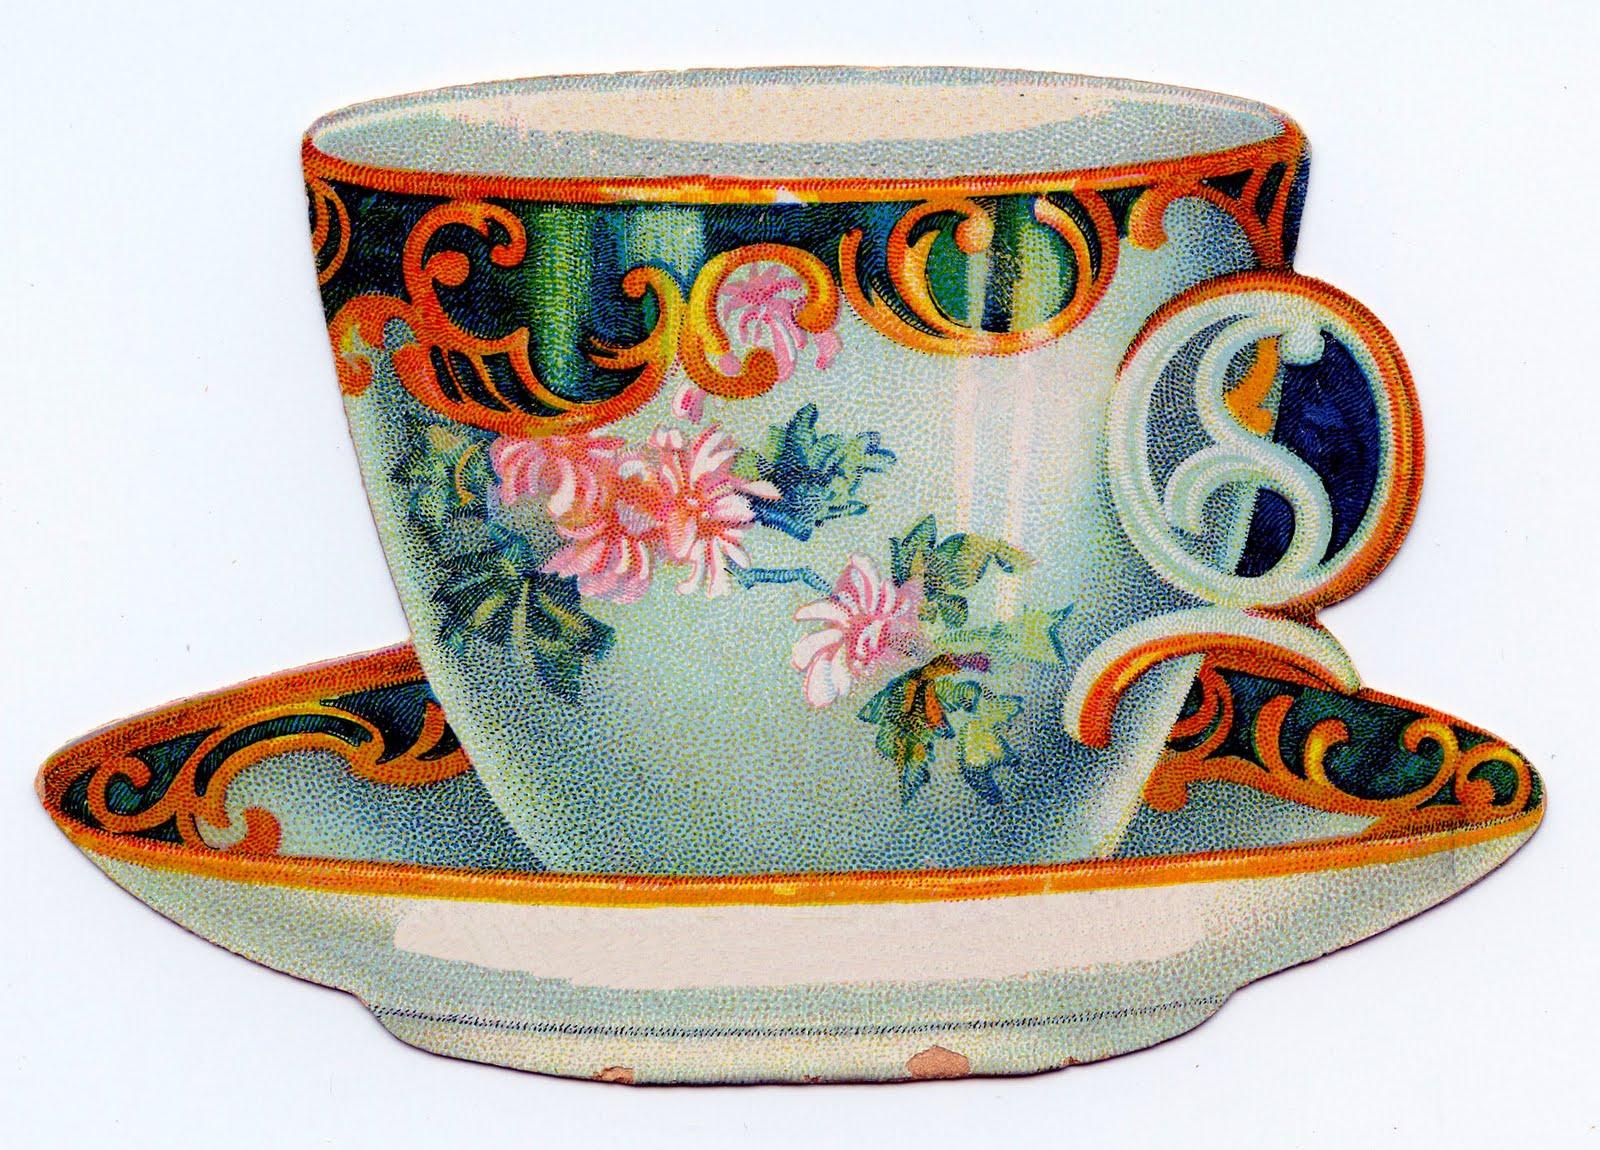 Teacup clipart vintage tea cup Cliparts Art Download Art Tea